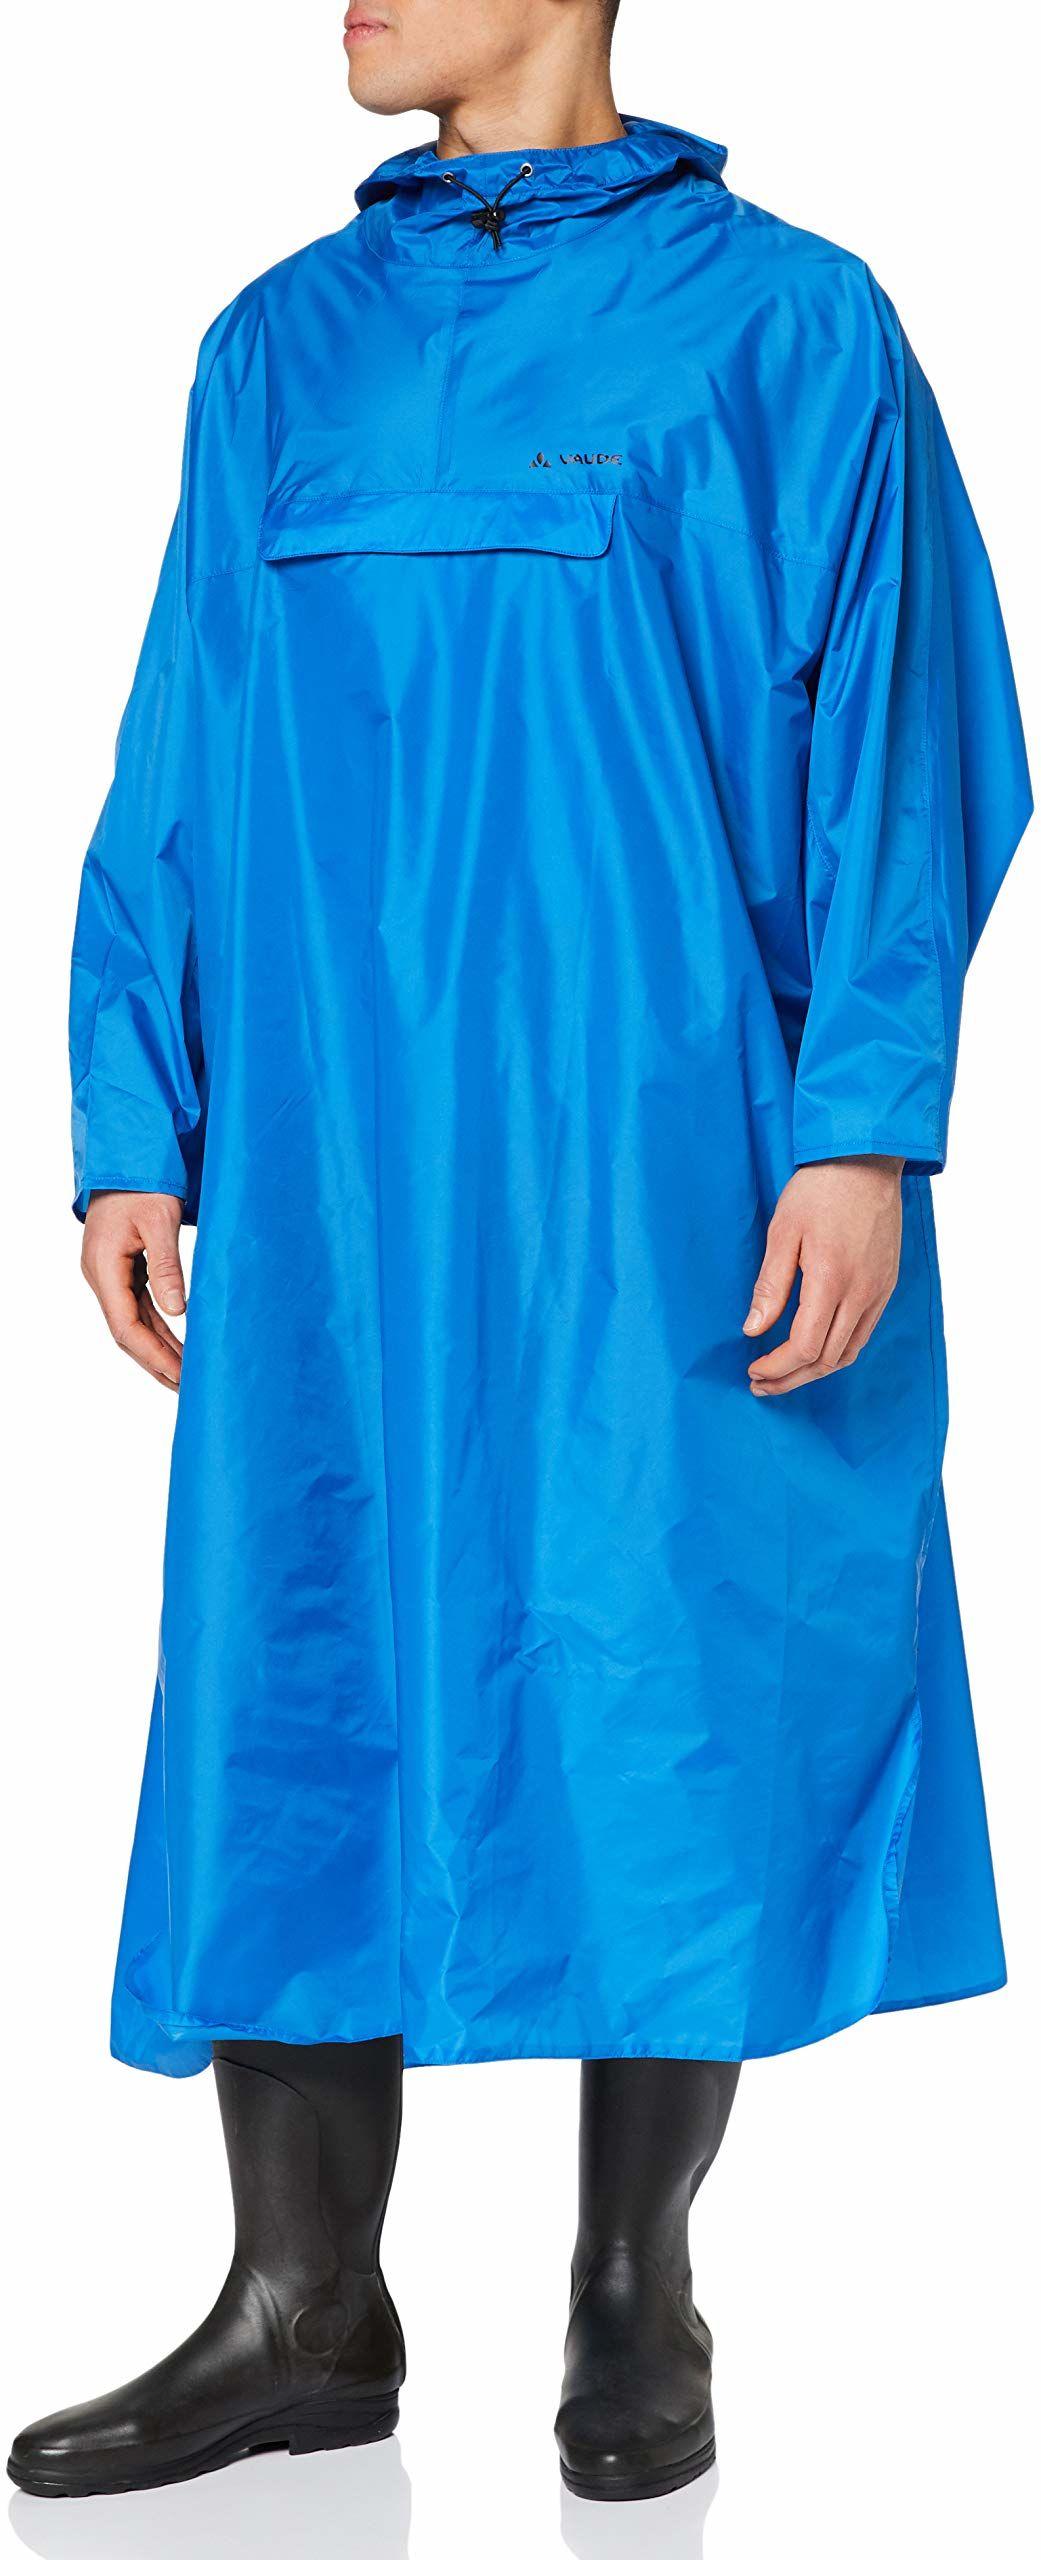 VAUDE 050393005300 ponczo męskie Hiking Backpack ponczo, niebieskie, S/M, 05039300